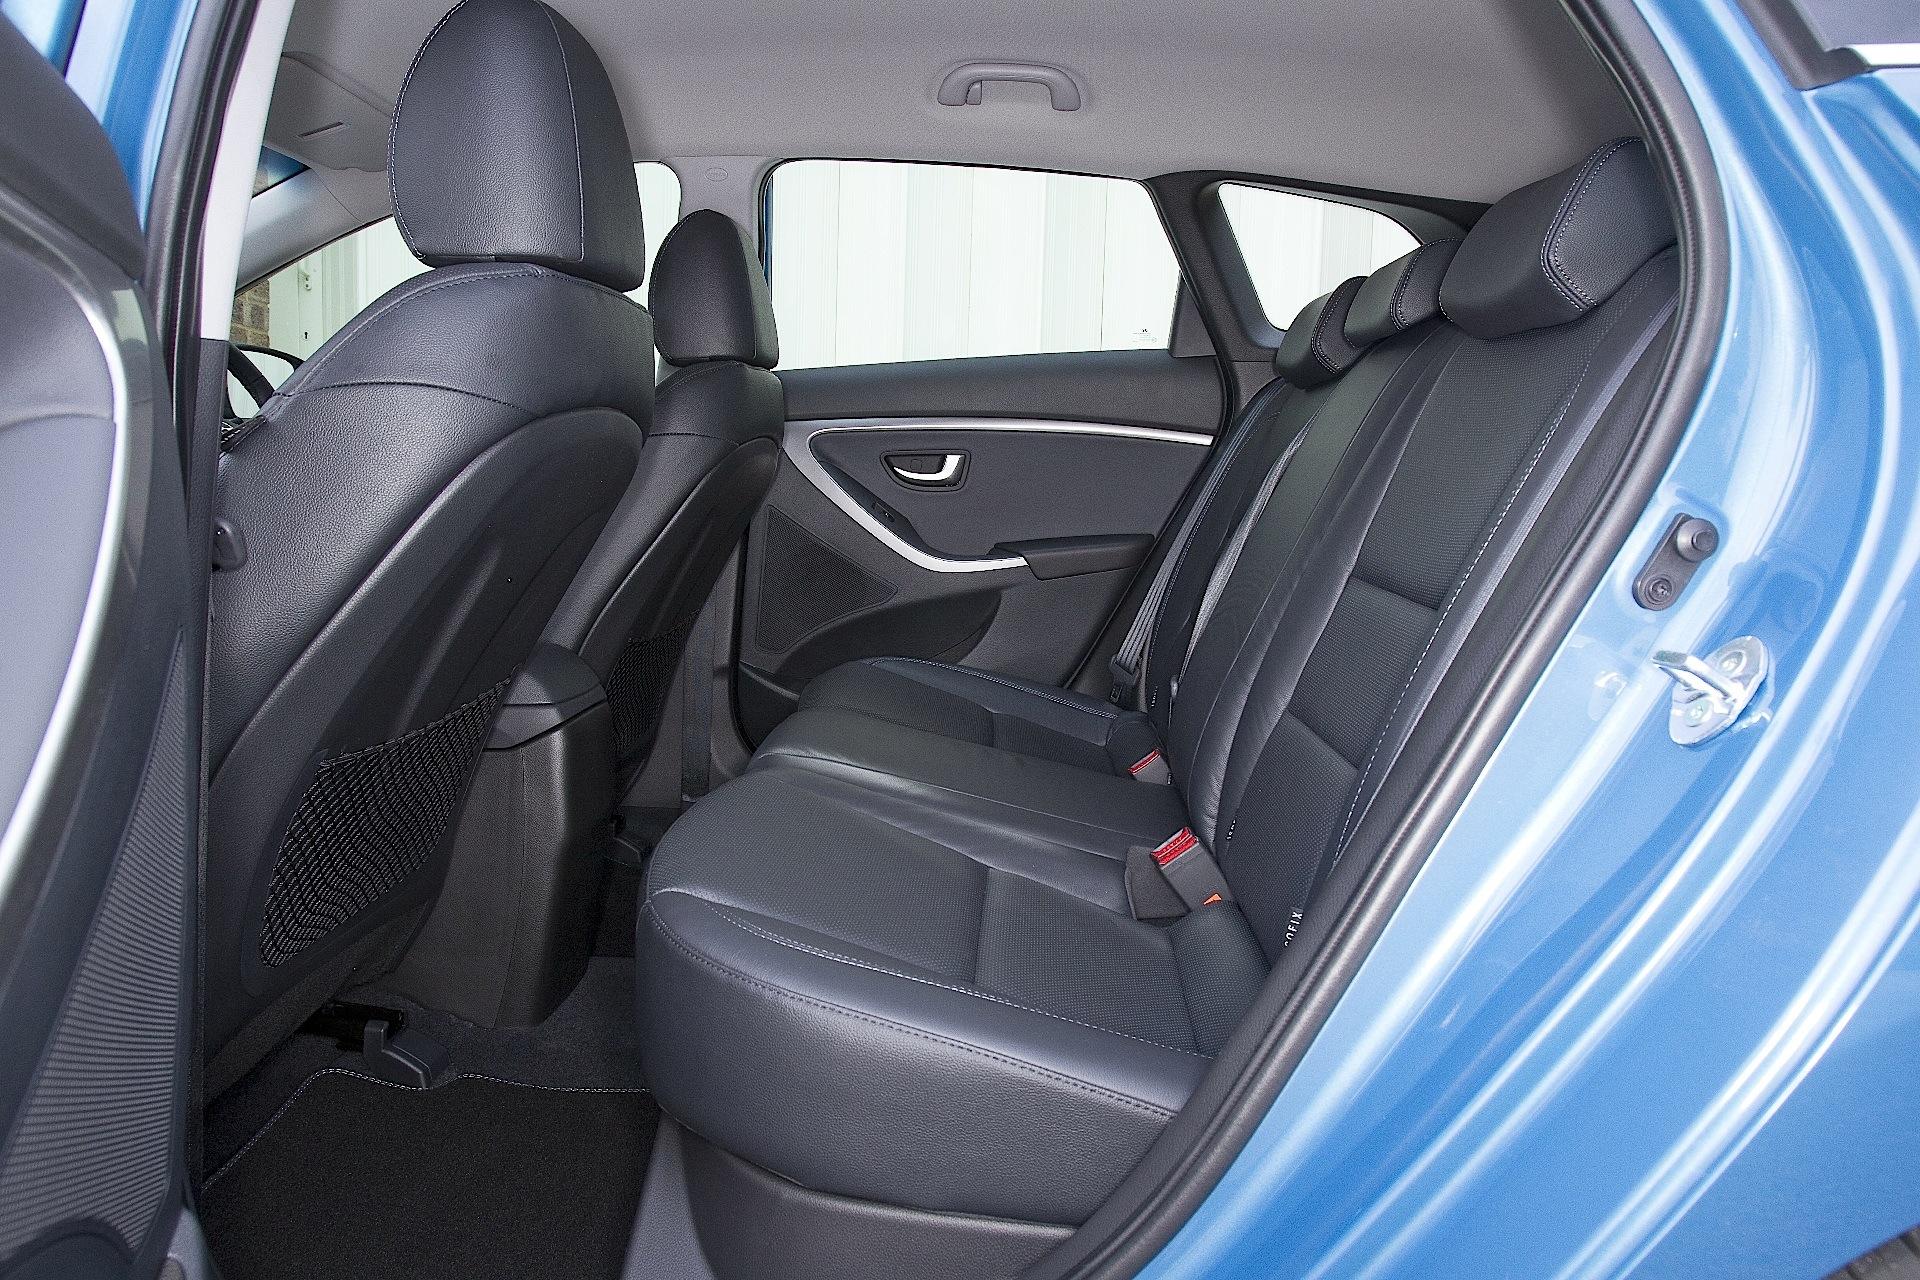 hyundai i30 wagon specs 2012 2013 2014 2015 2016 2017 autoevolution. Black Bedroom Furniture Sets. Home Design Ideas